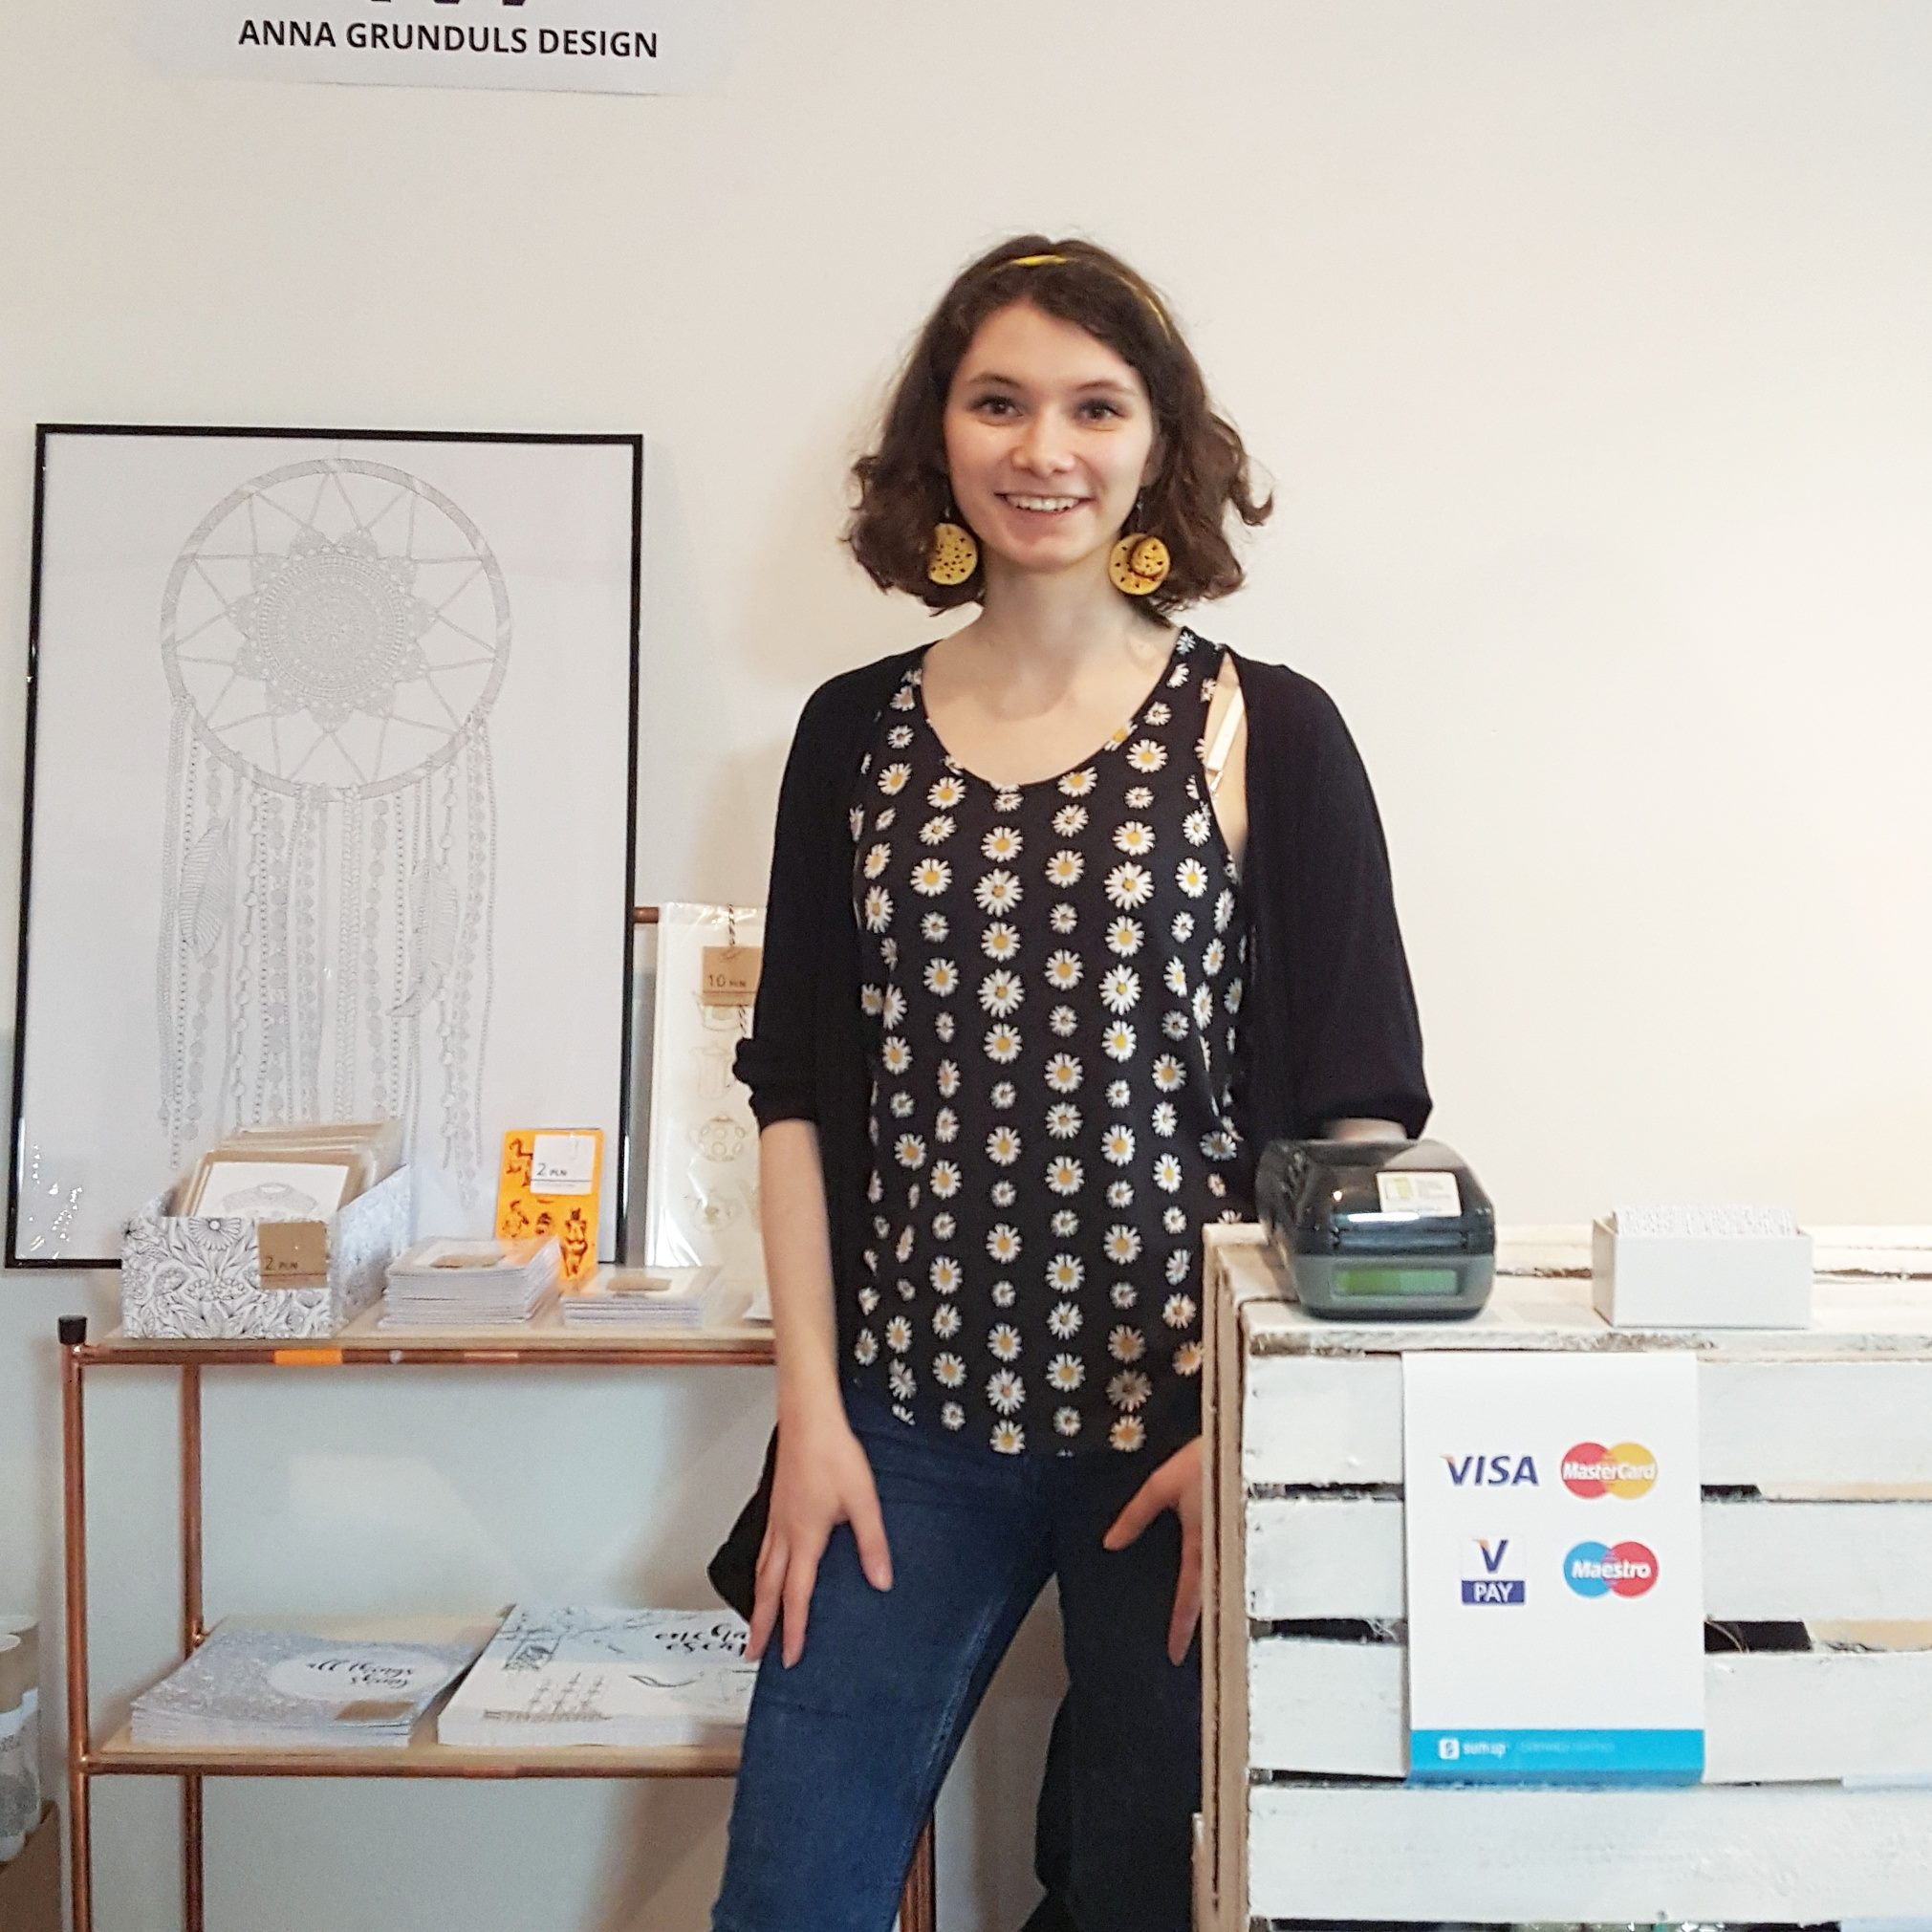 Anna Grunduls Design press page